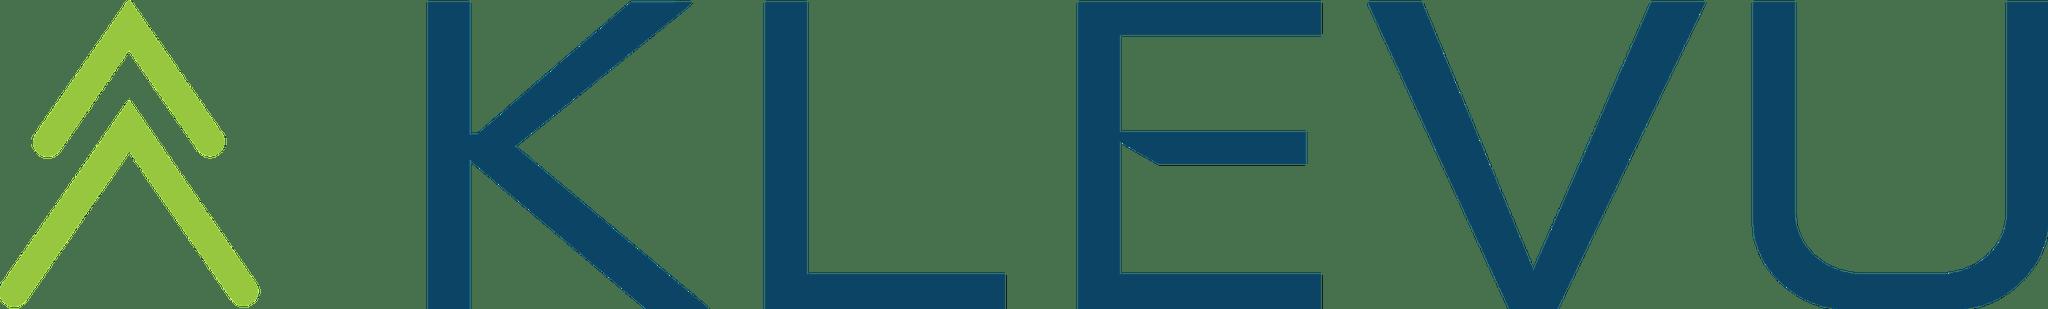 UX & CRO Track Sponsor